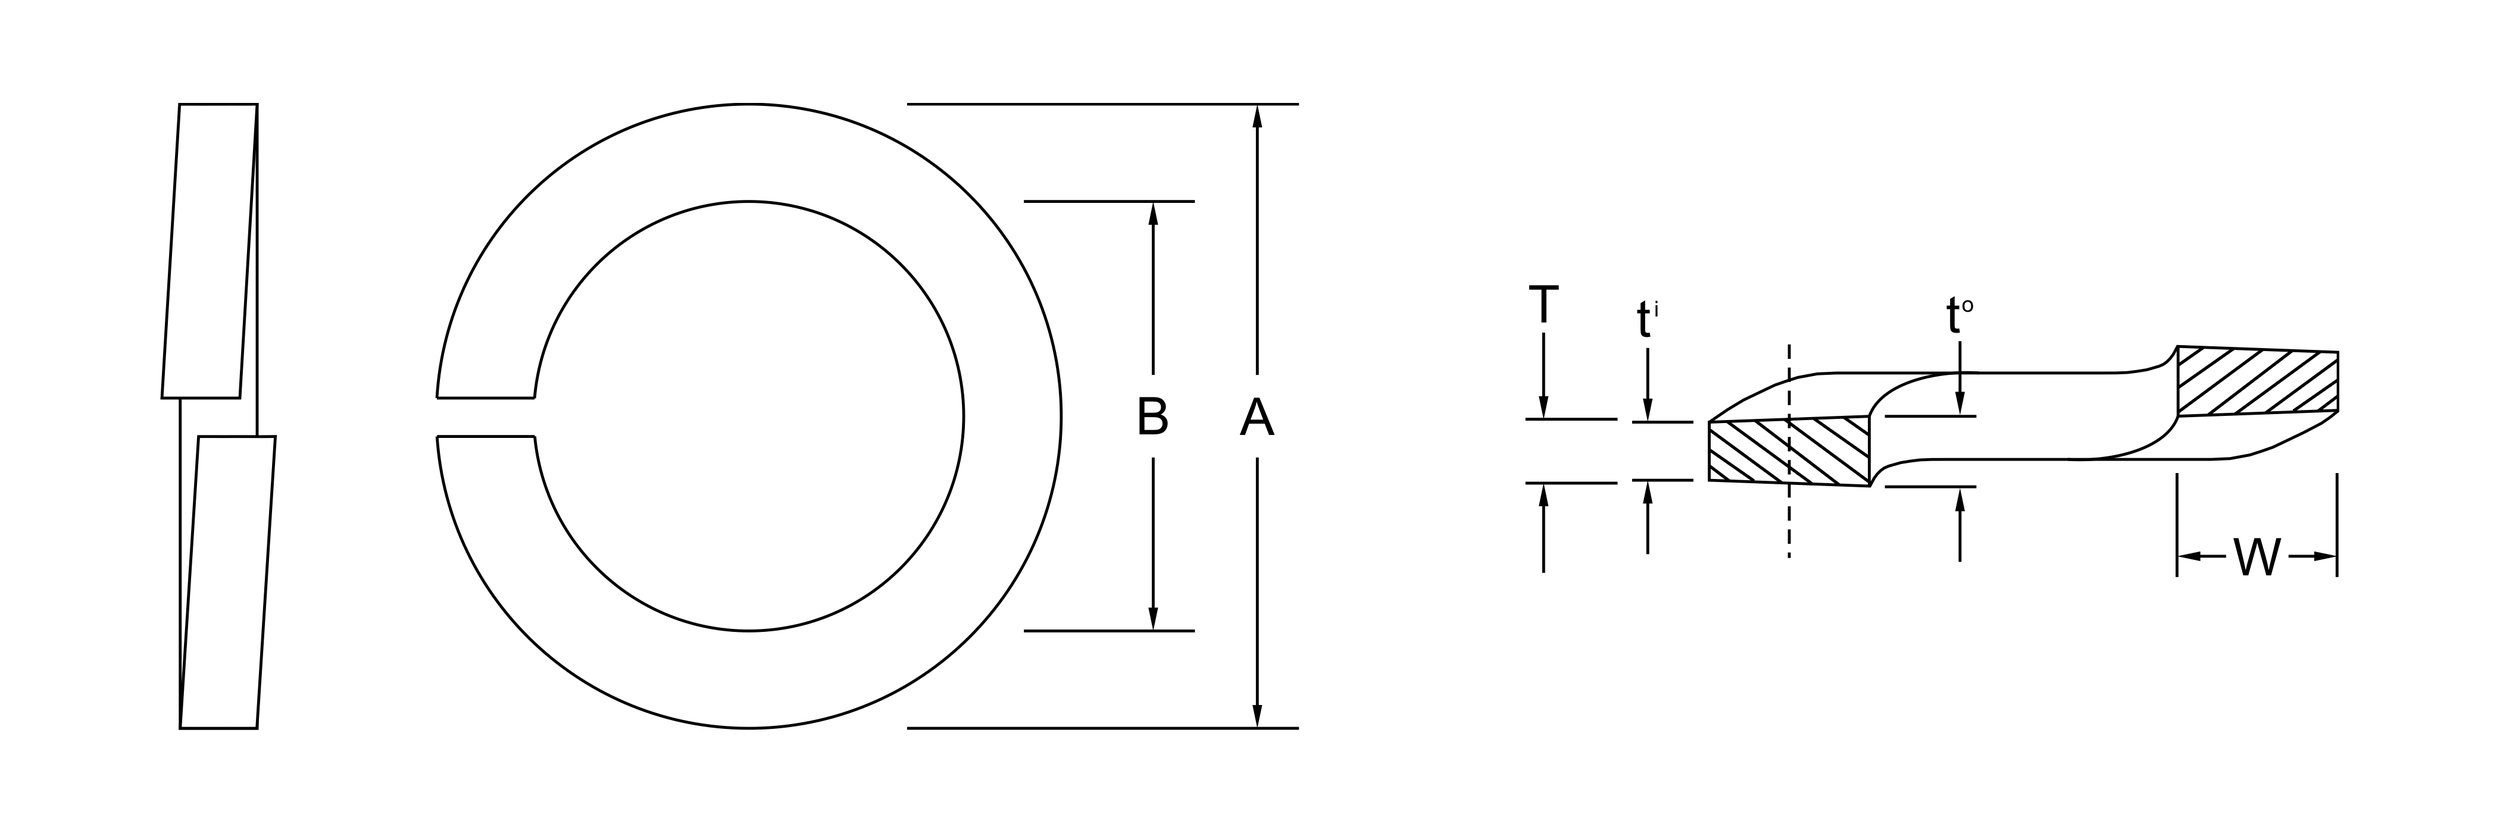 split lock washer dimensions